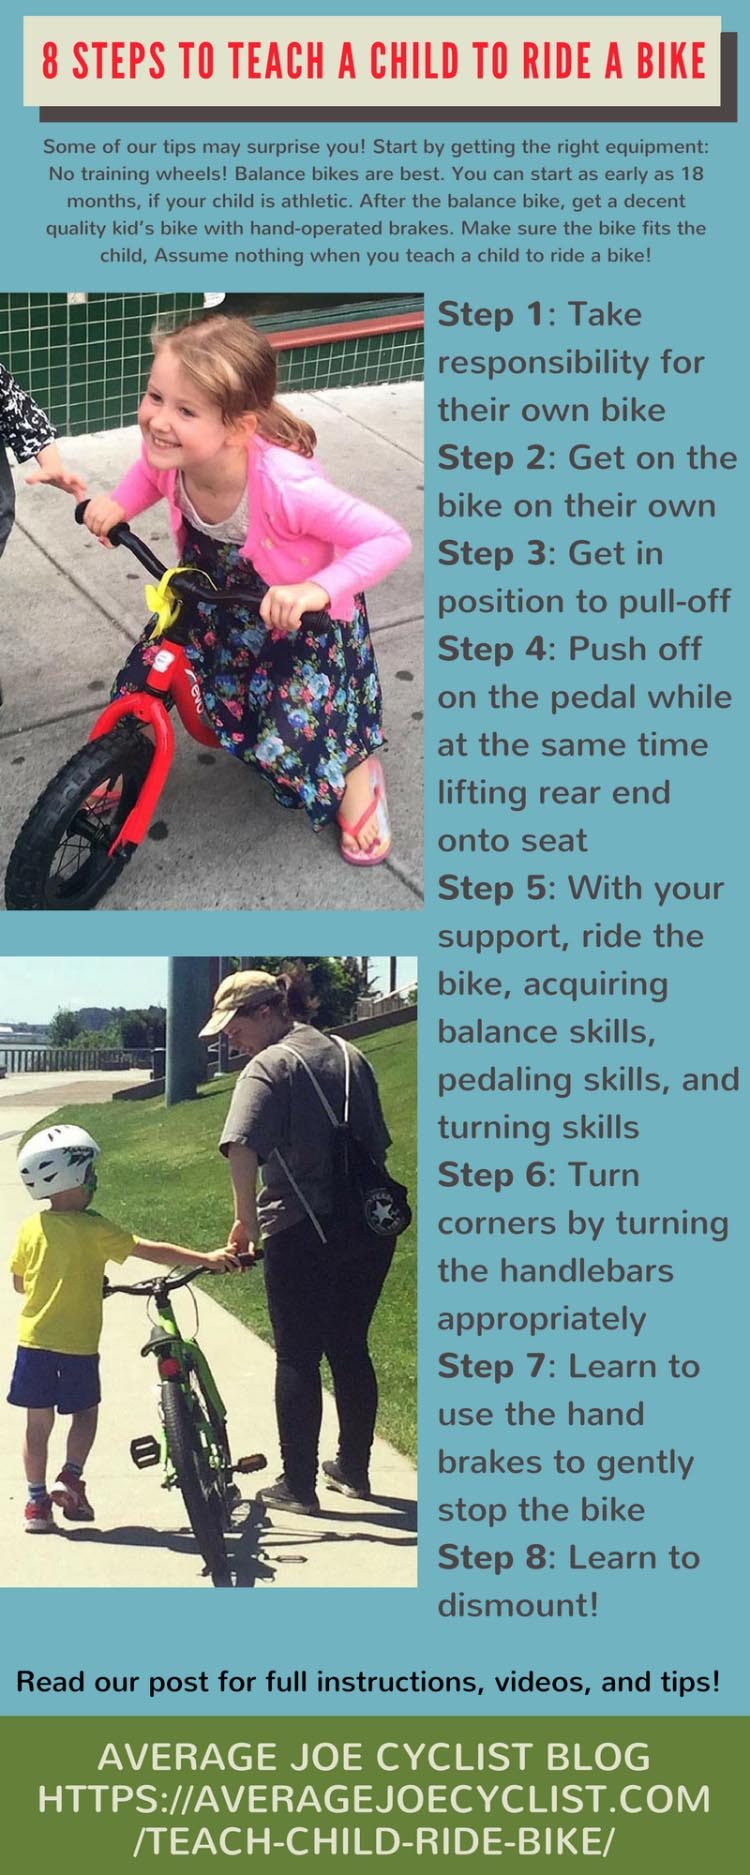 8 steps to teach a child to ride a bike